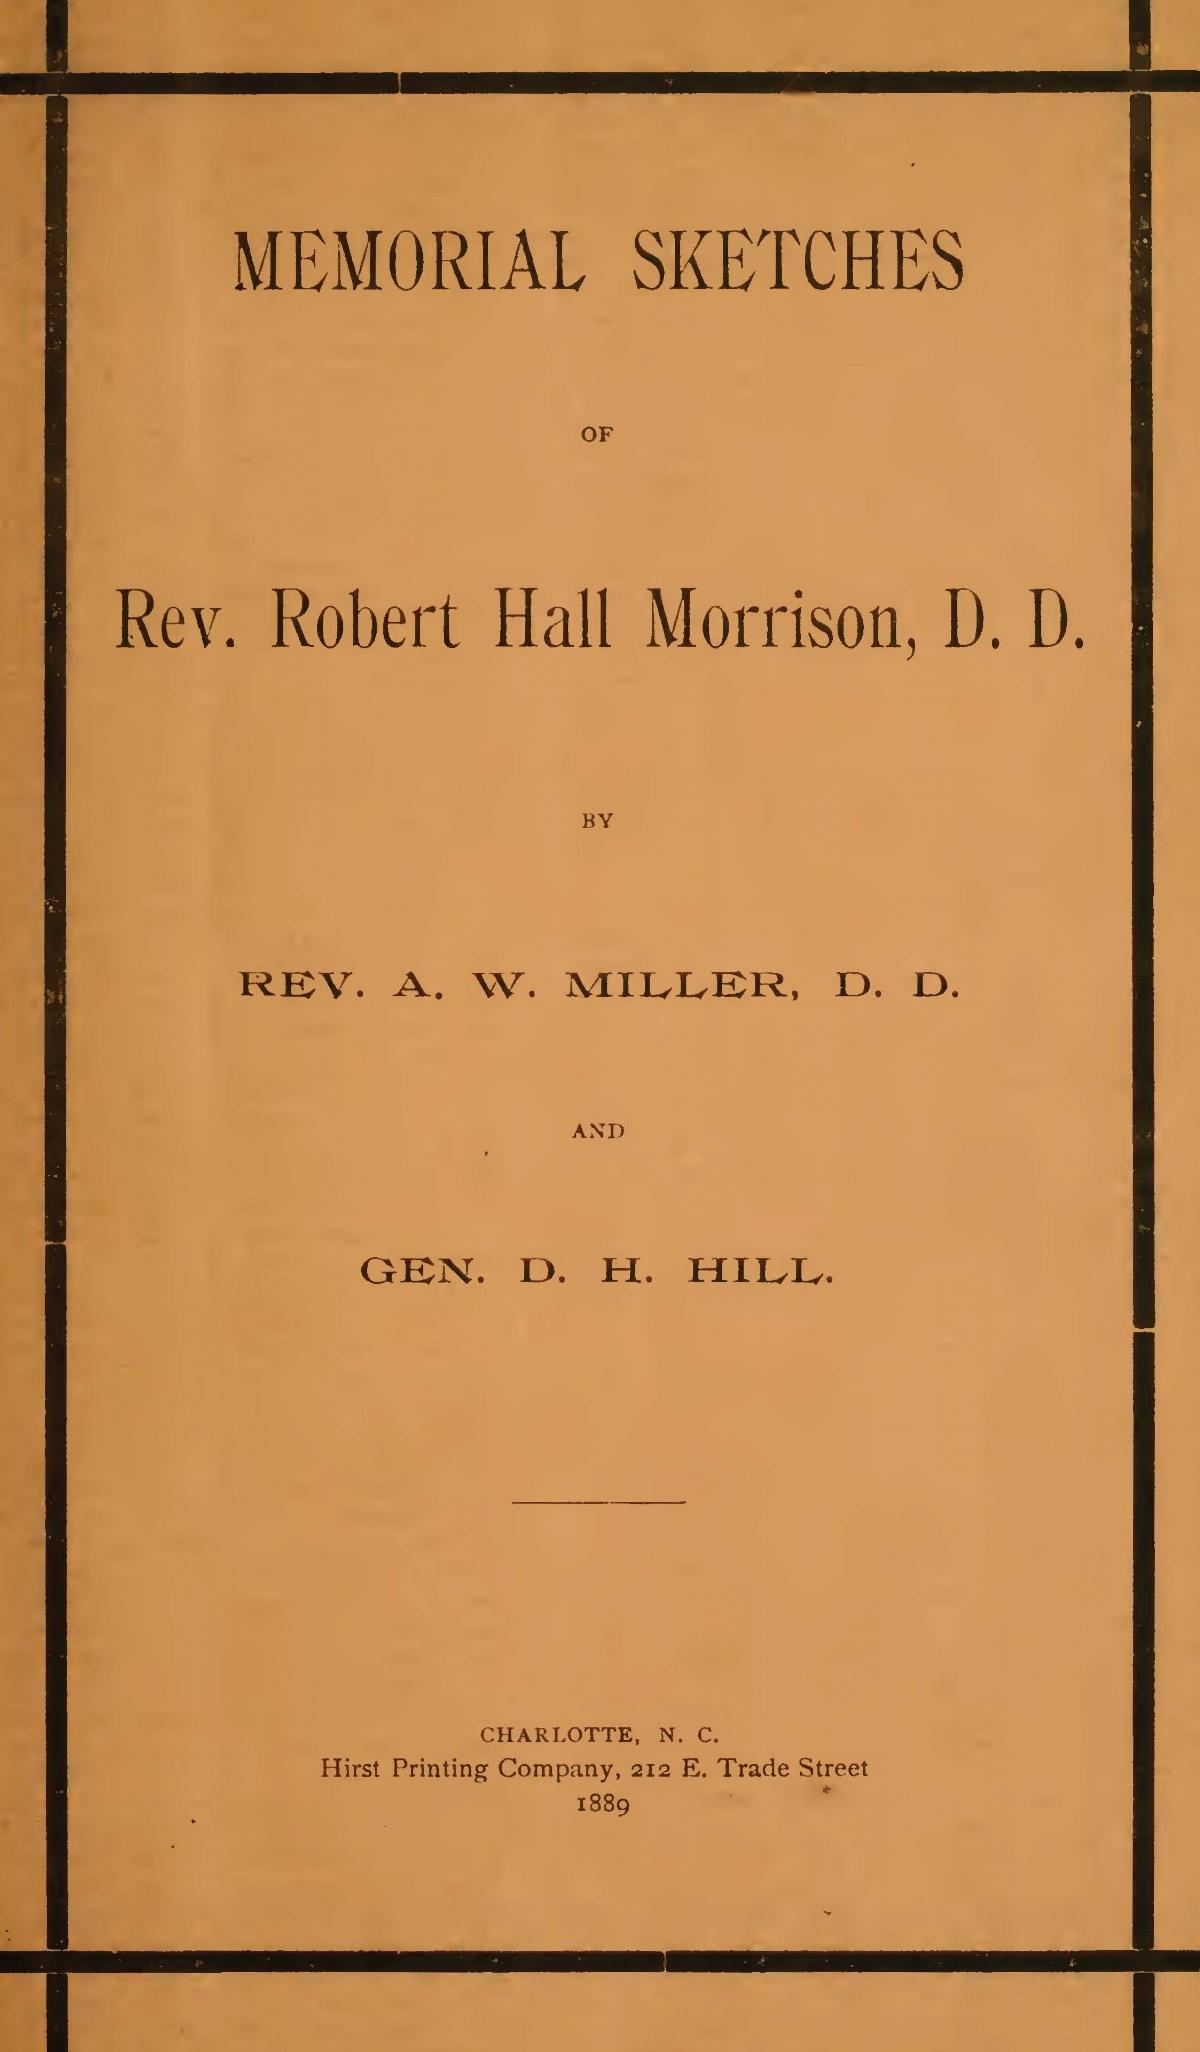 Hill, Daniel Harvey, Memorial Sketches of Rev. Robert Hall Morrison, D.D. Title Page.jpg